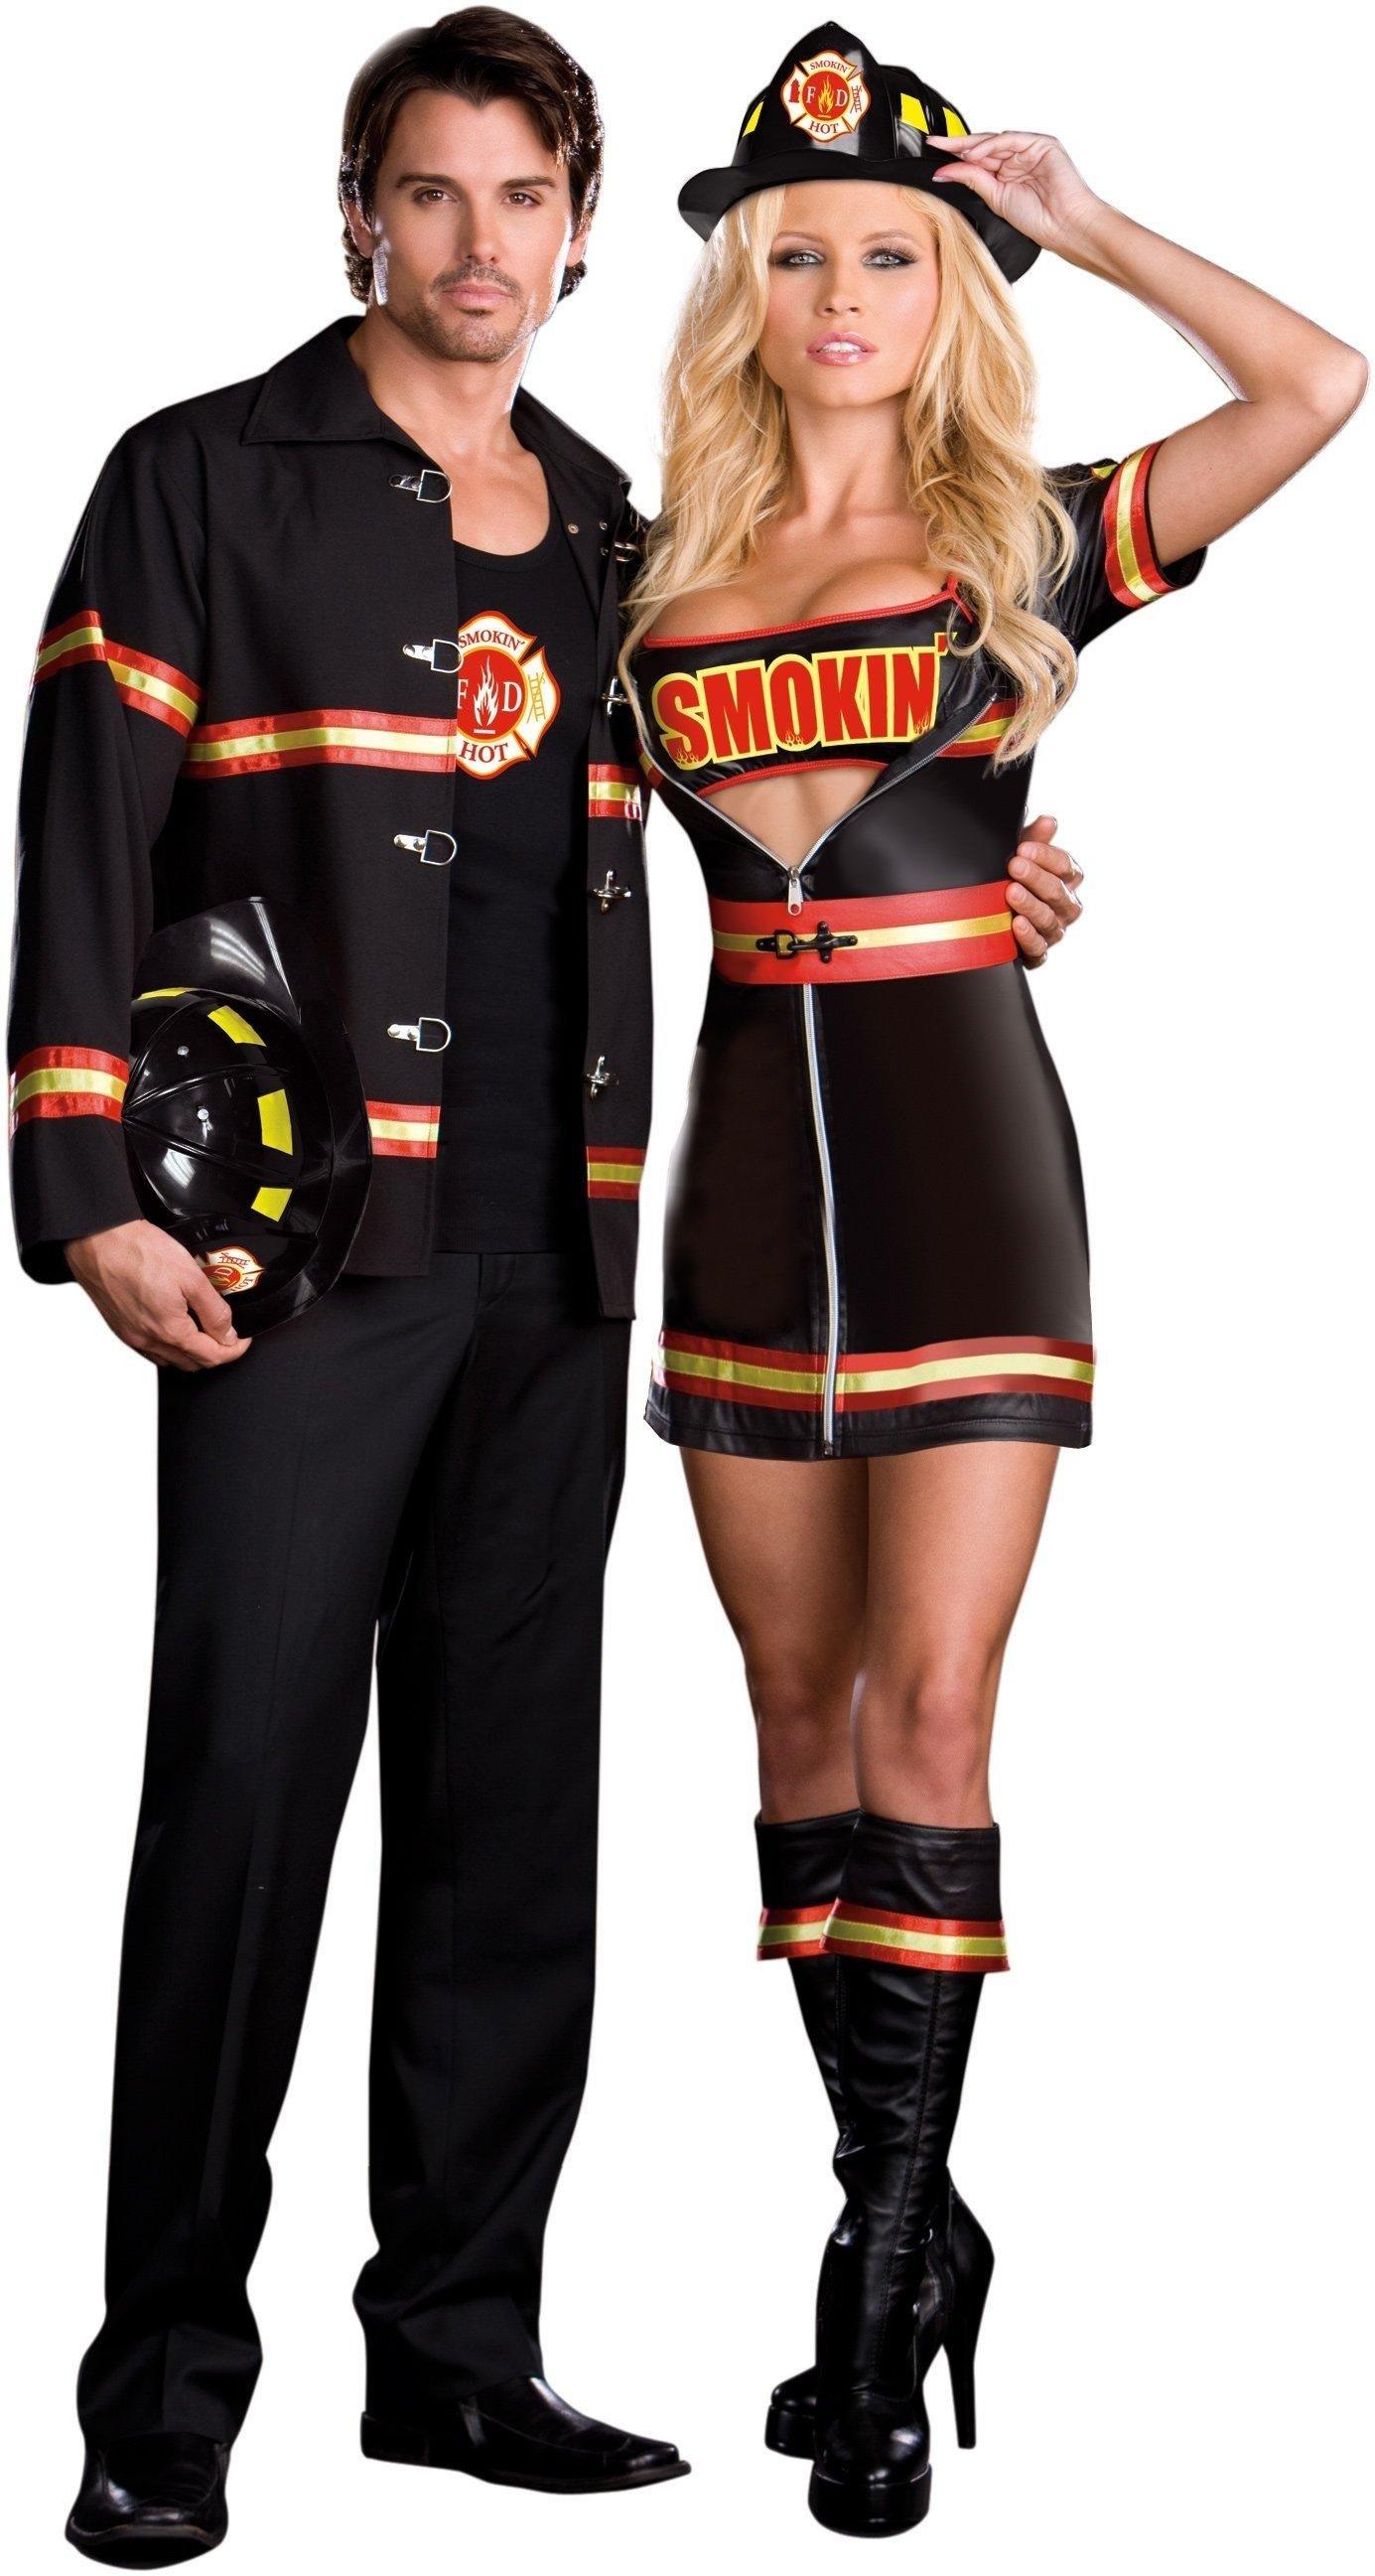 10 Pretty Cute Couple Halloween Costume Ideas 35 couples halloween costumes ideas inspirationseek 15 2021